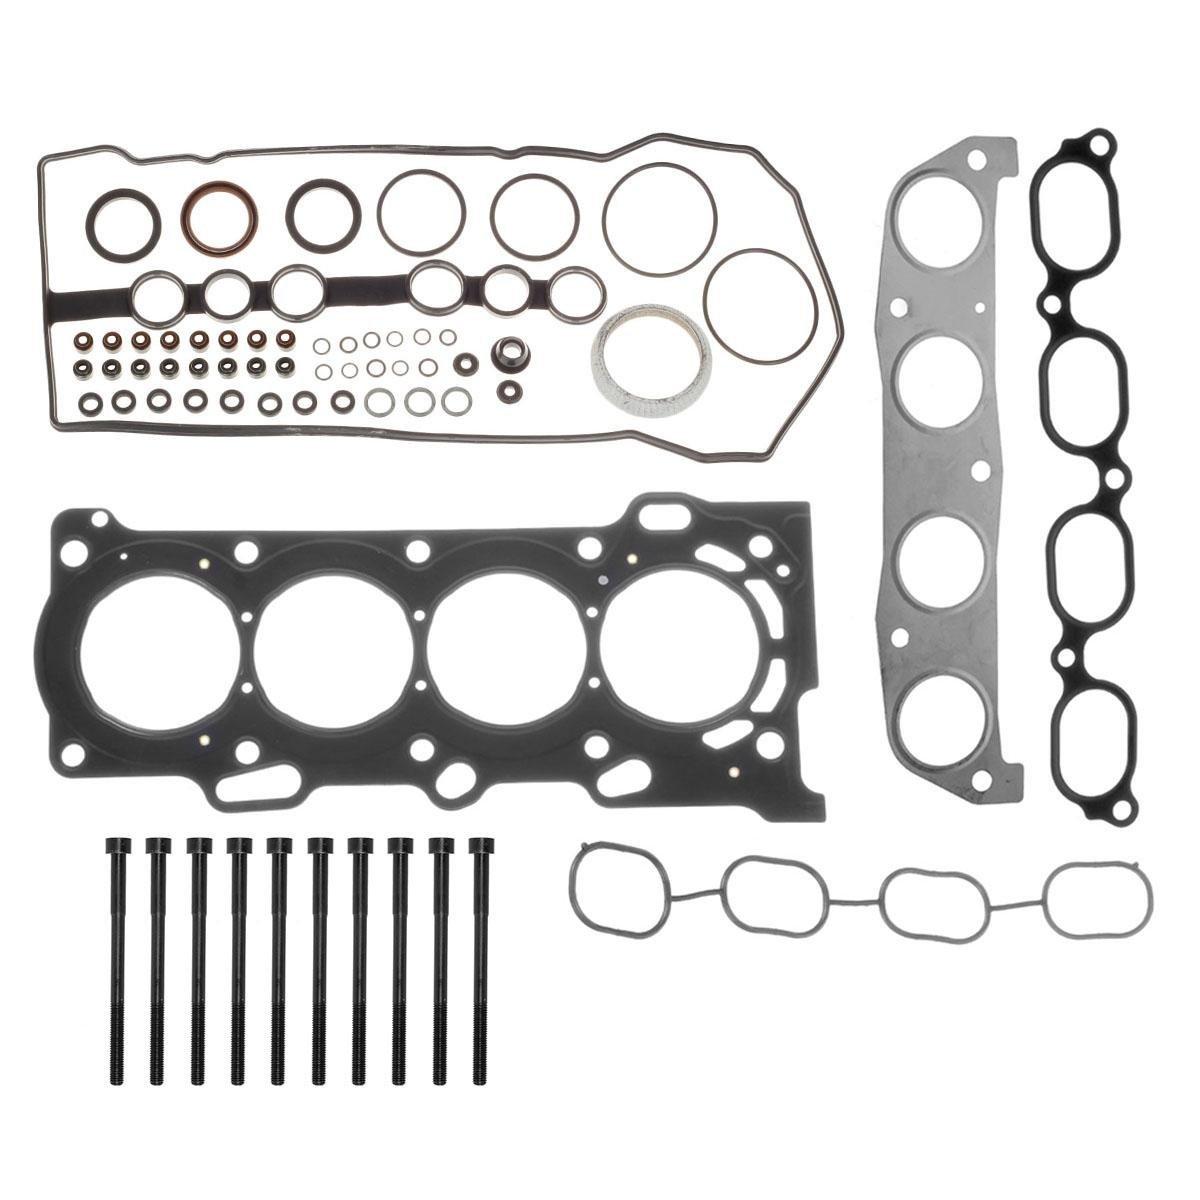 Vincos Head Gasket Bolts kit Replacement For Chevrolet Prizm Pontiac Vibe Toyota Corolla Celica GT Matrix XR MR2 Spyder 1.8L L4 DOHC 1ZZFE